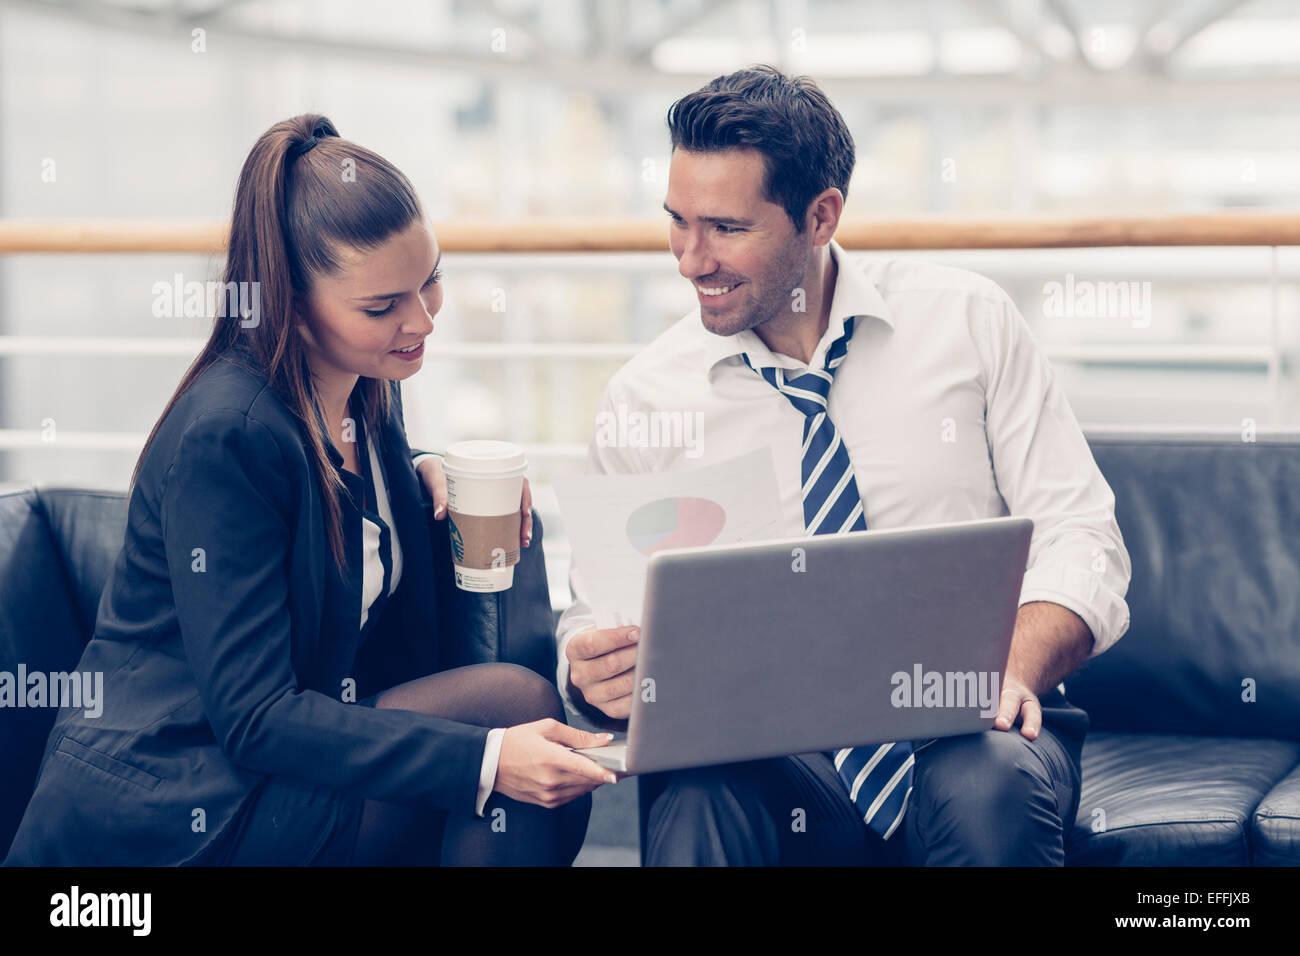 Business im genes de stock business fotos de stock alamy for Maduras en la oficina